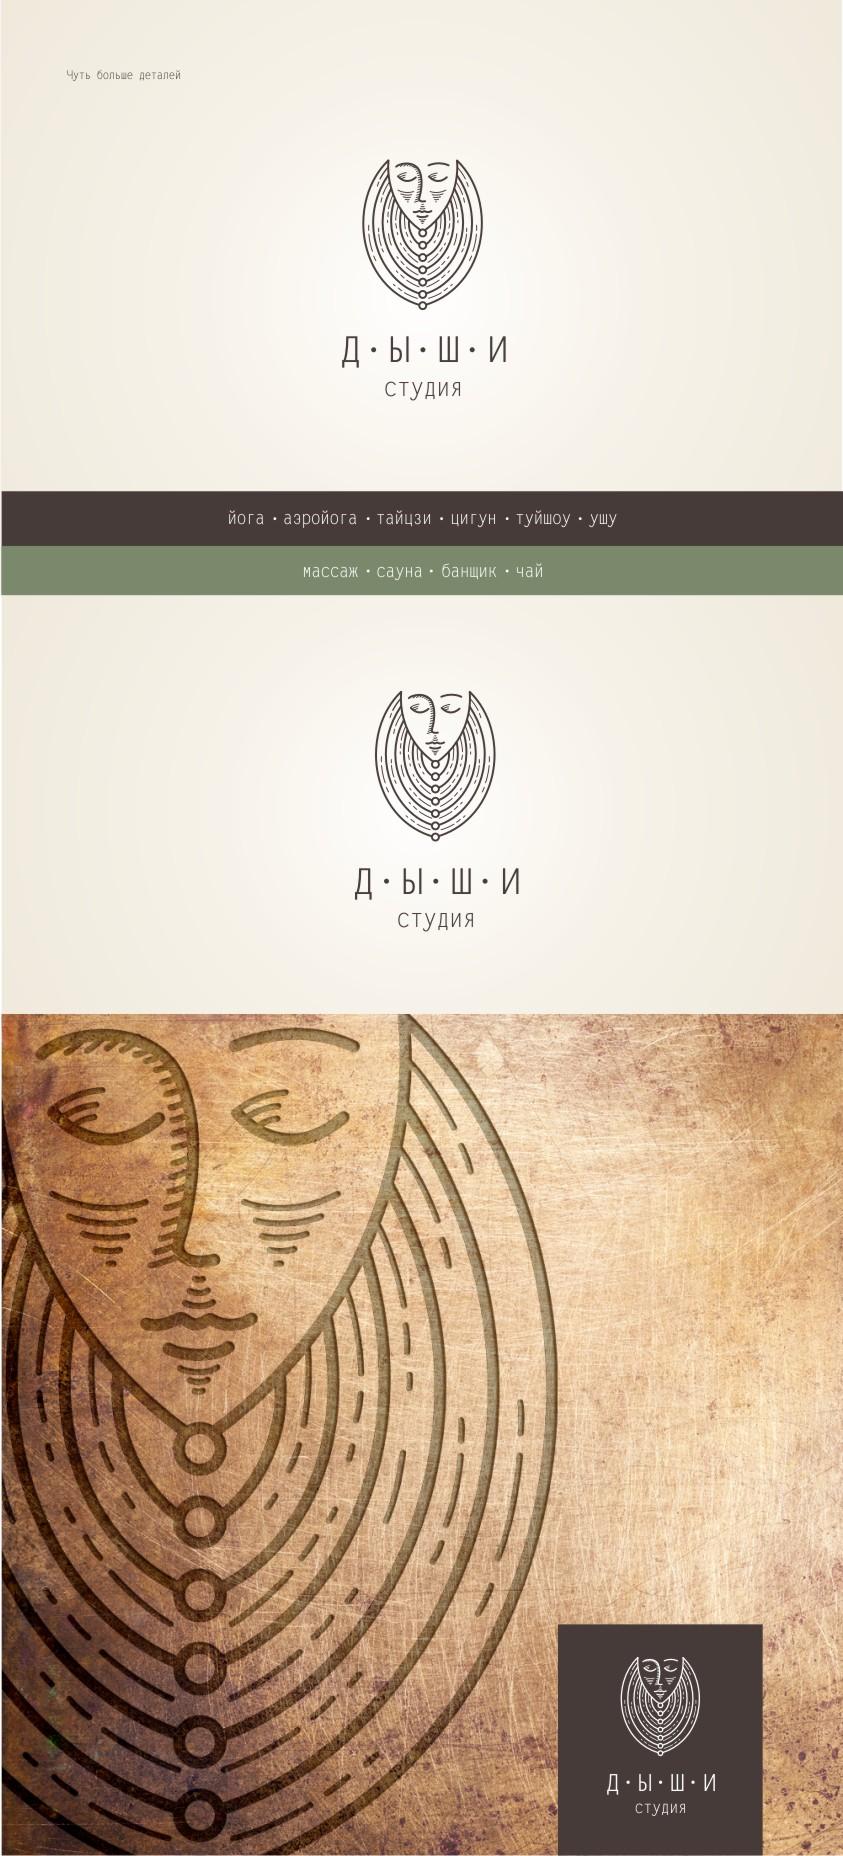 "Логотип для студии ""Дыши""  и фирменный стиль фото f_80756f3abb1d15cf.jpg"